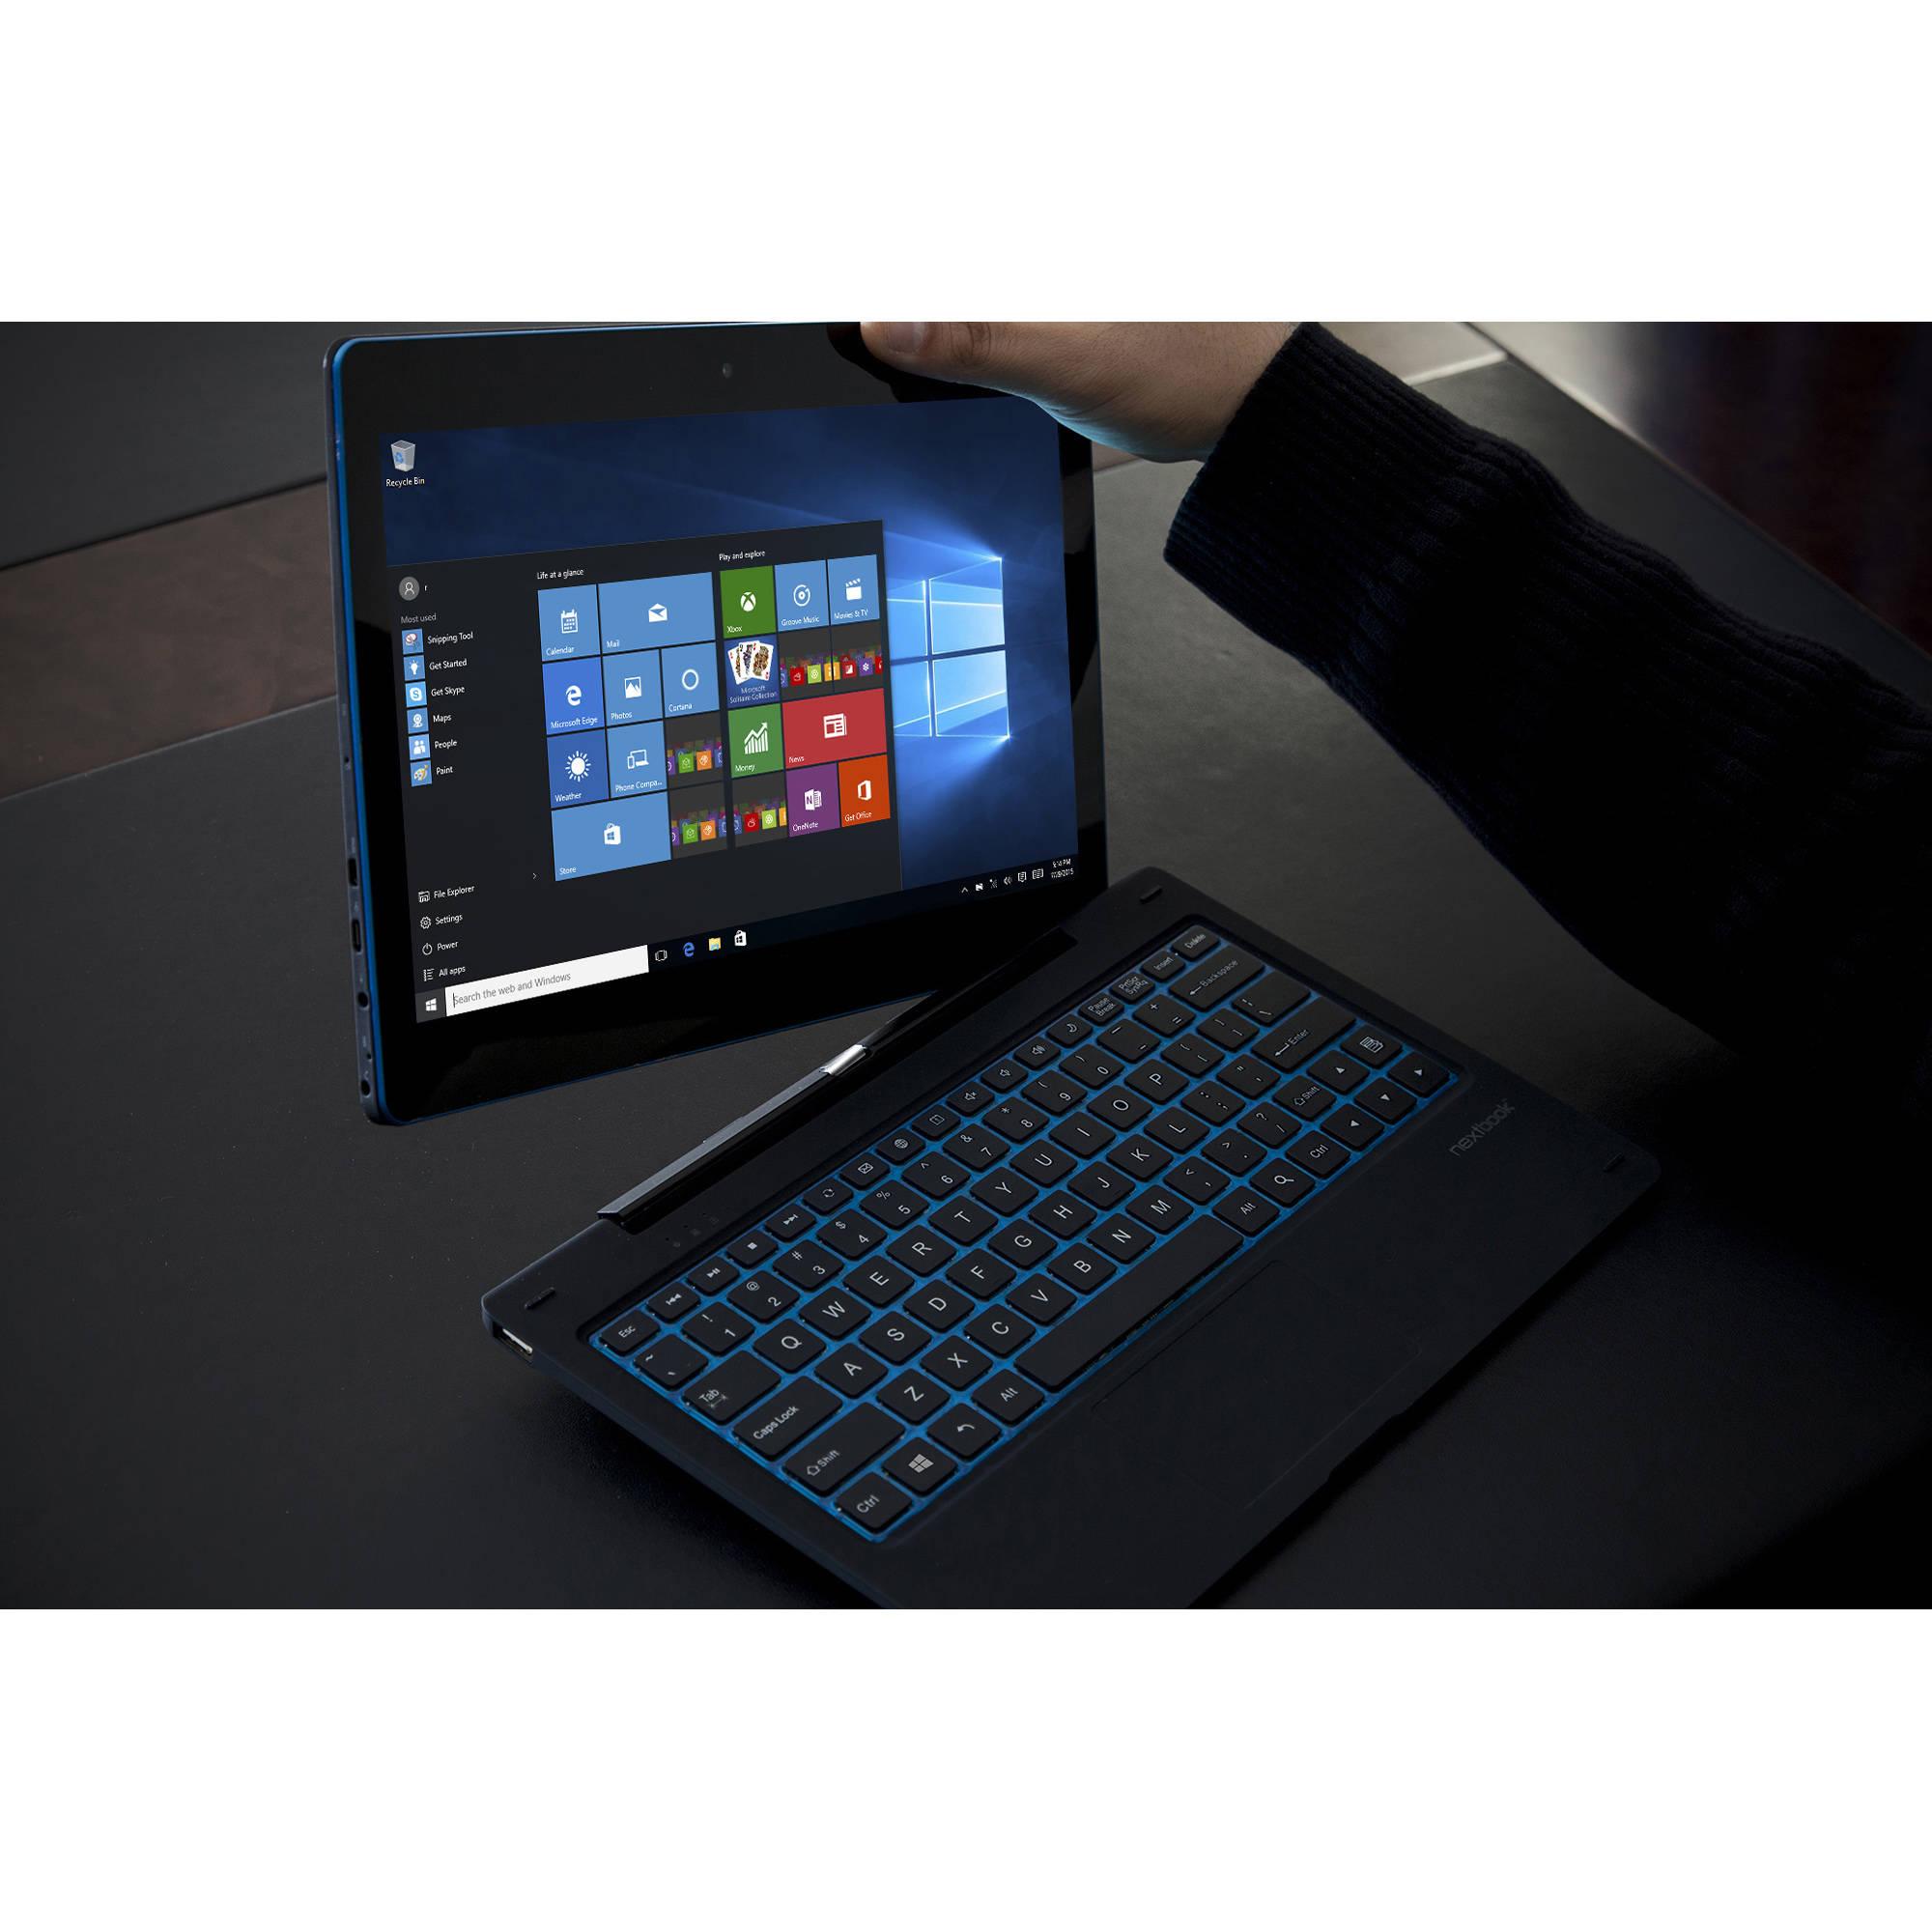 Windows nextbook flex 10 - Nextbook Flexx 11 6 2 In 1 Tablet 2 64gb Intel Quad Core Windows 10 Walmart Com